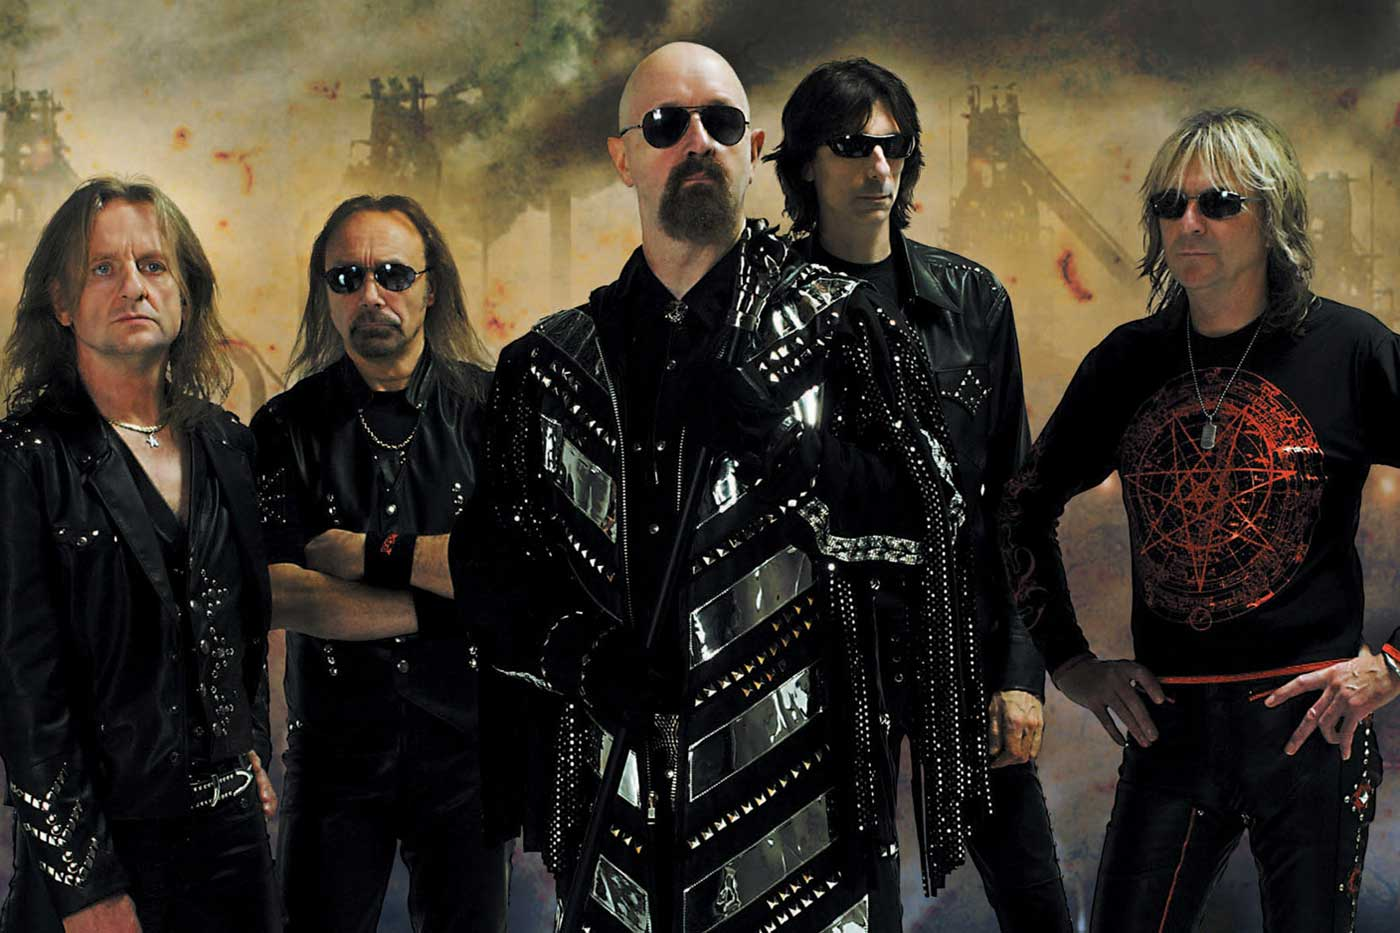 Judas Priest encabezan la nueva tanda del Rock Fest Barcelona 2020